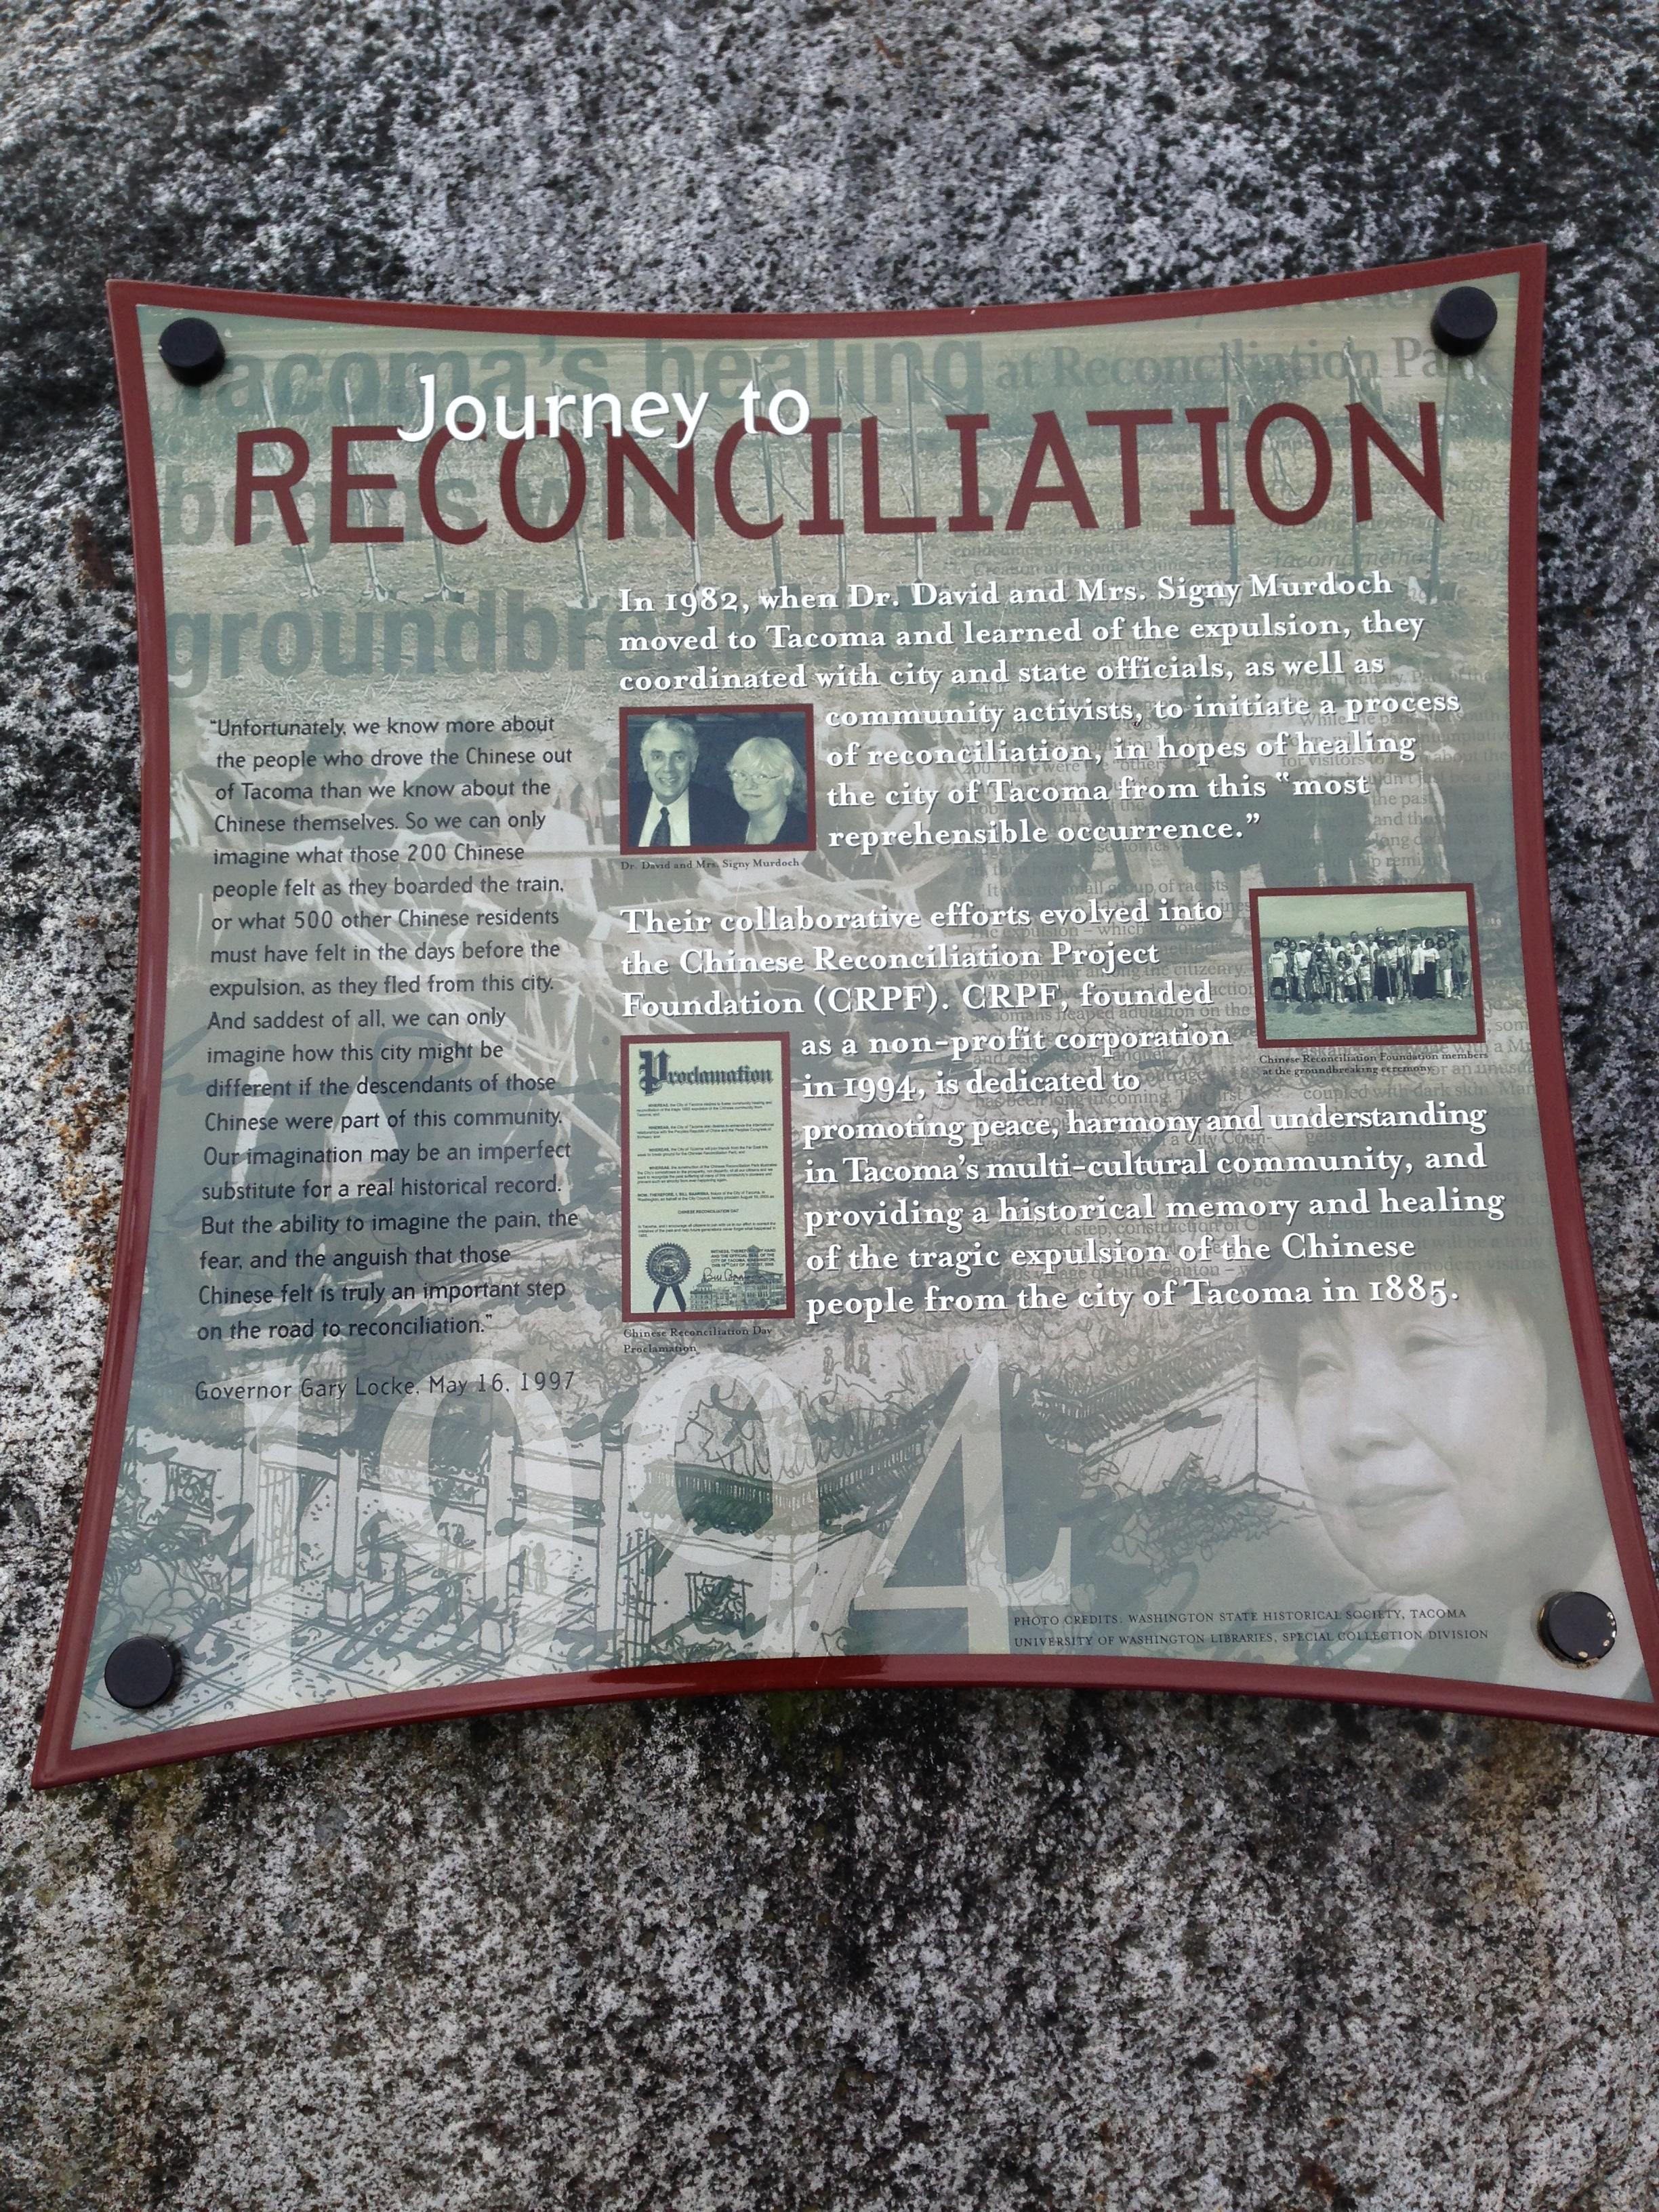 Plaque detailing the Reconciliation process and the construction of Reconciliation Park. Cesare Bigolin.